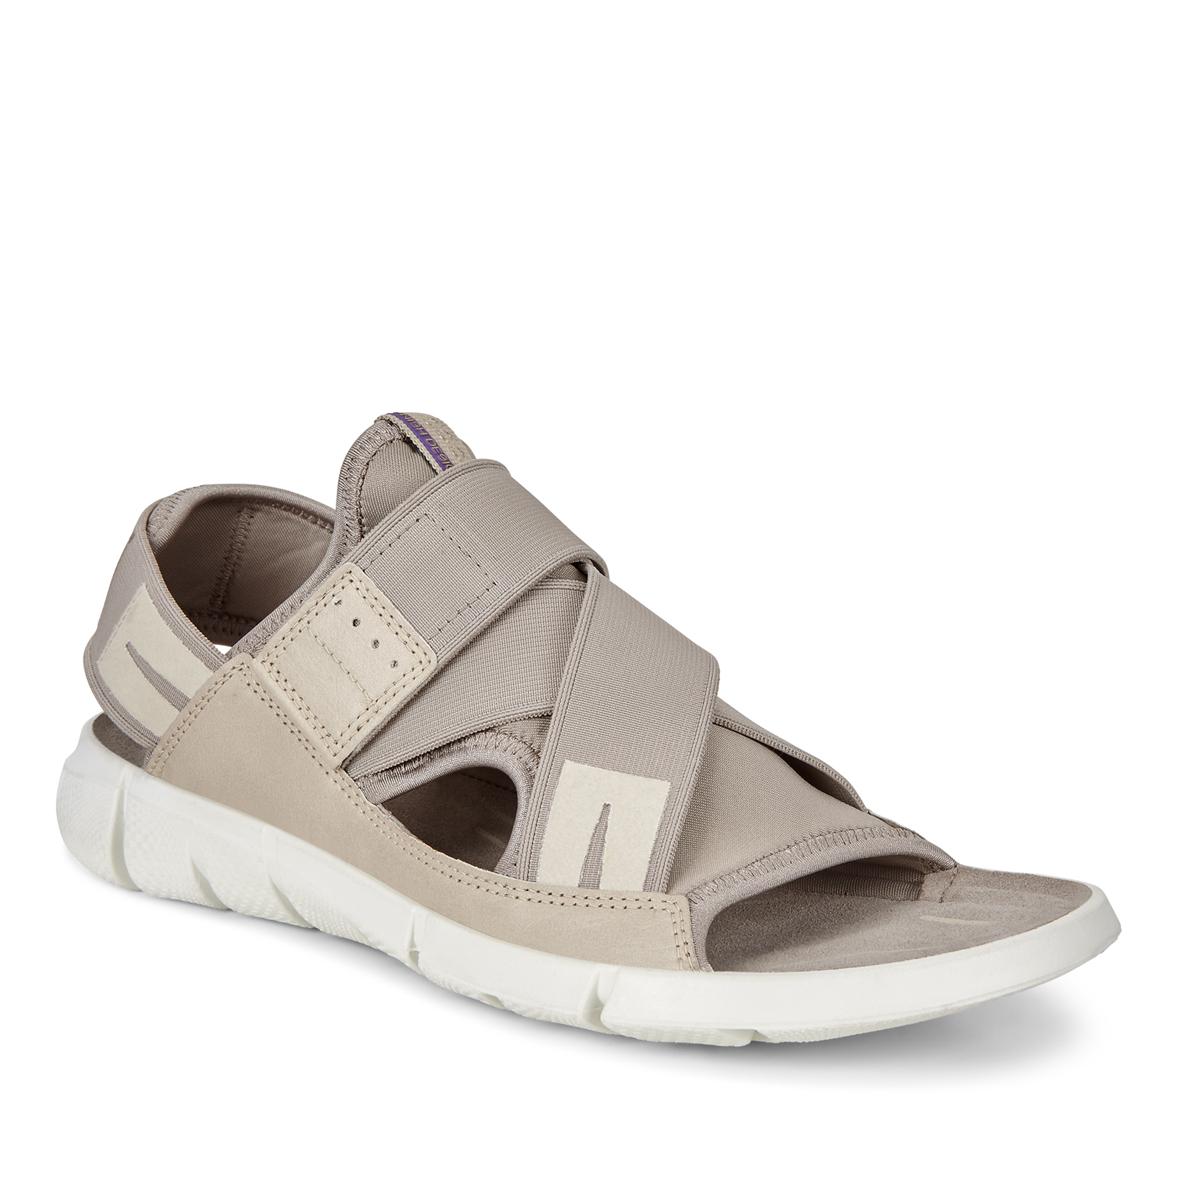 Rosenborg Sko Flade sandaler Ecco Ecco Intrinsic Ladies